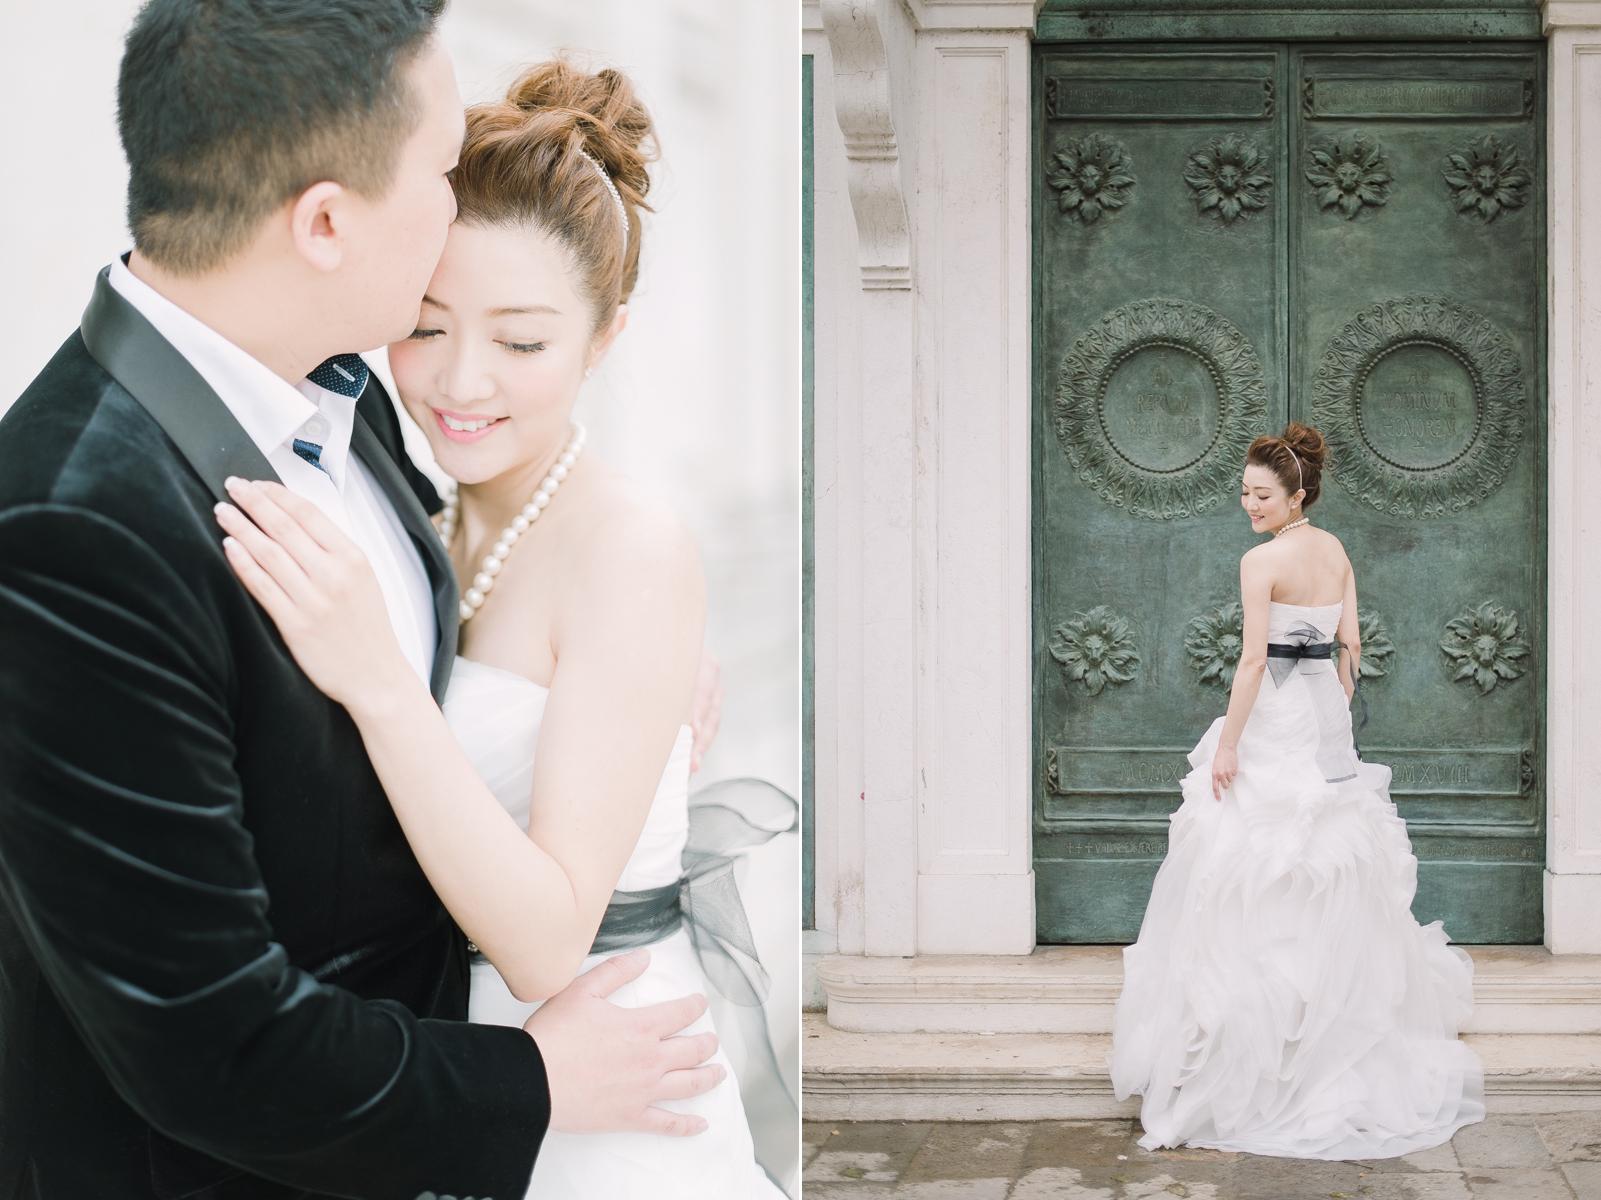 Boheme-Moon-Photography-Honeymoon-Pre-Wedding-in-Venice-Italy_09.jpg